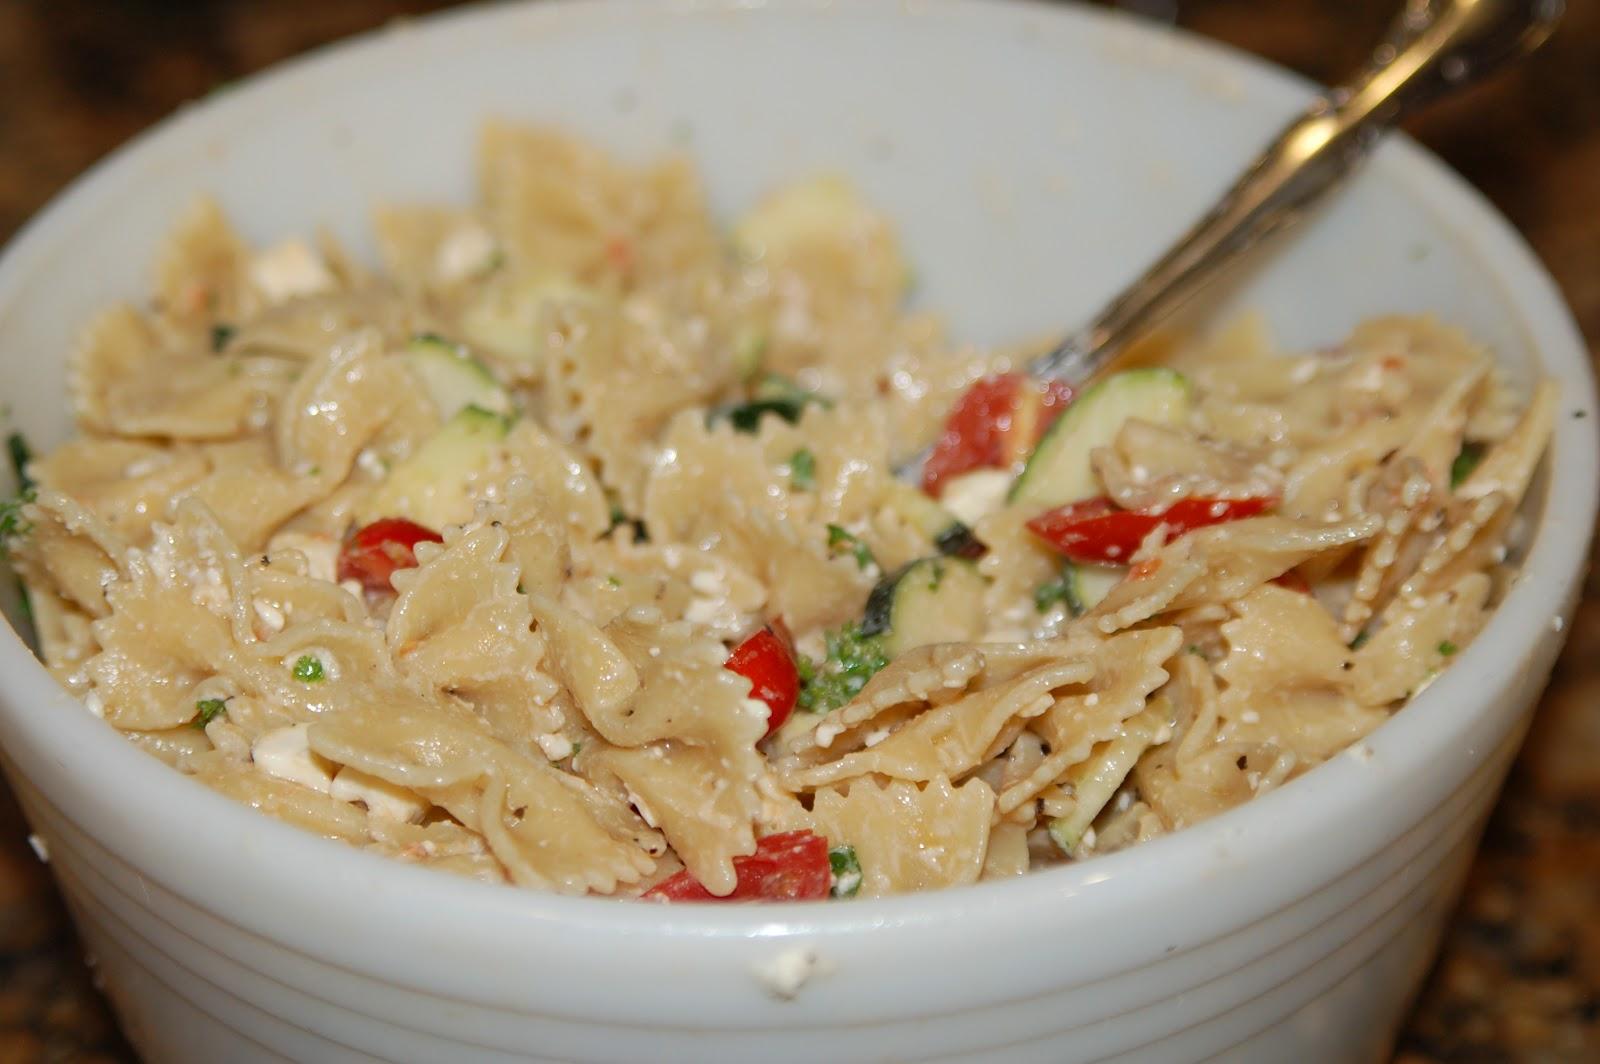 Samma Spot: Pasta Salad with Zucchini, Tomatoes & Feta